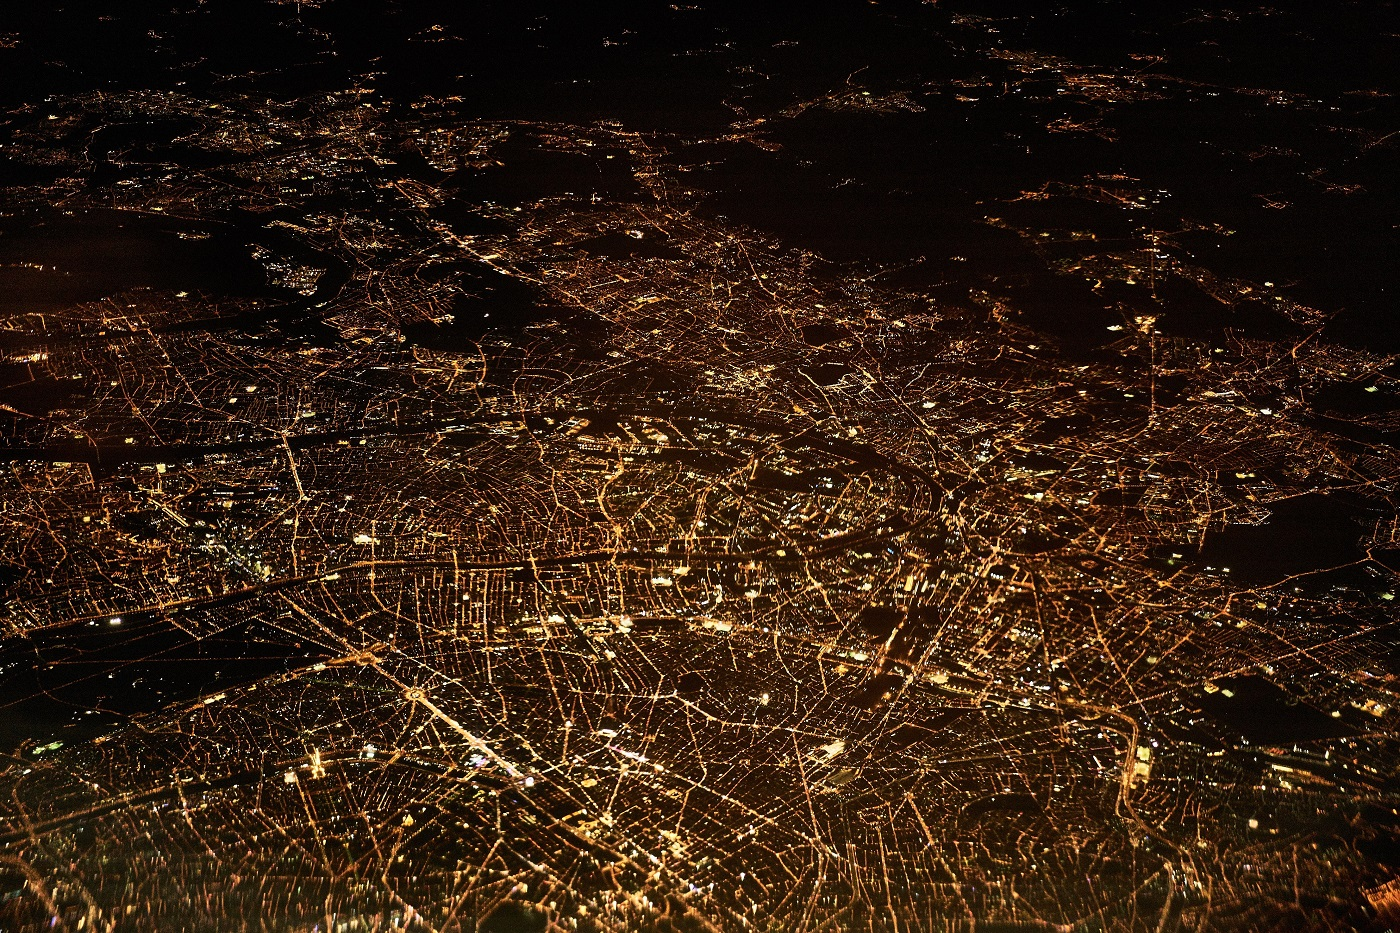 40-61_Pollution lumineuse - dennis-kummer-171041-unsplash